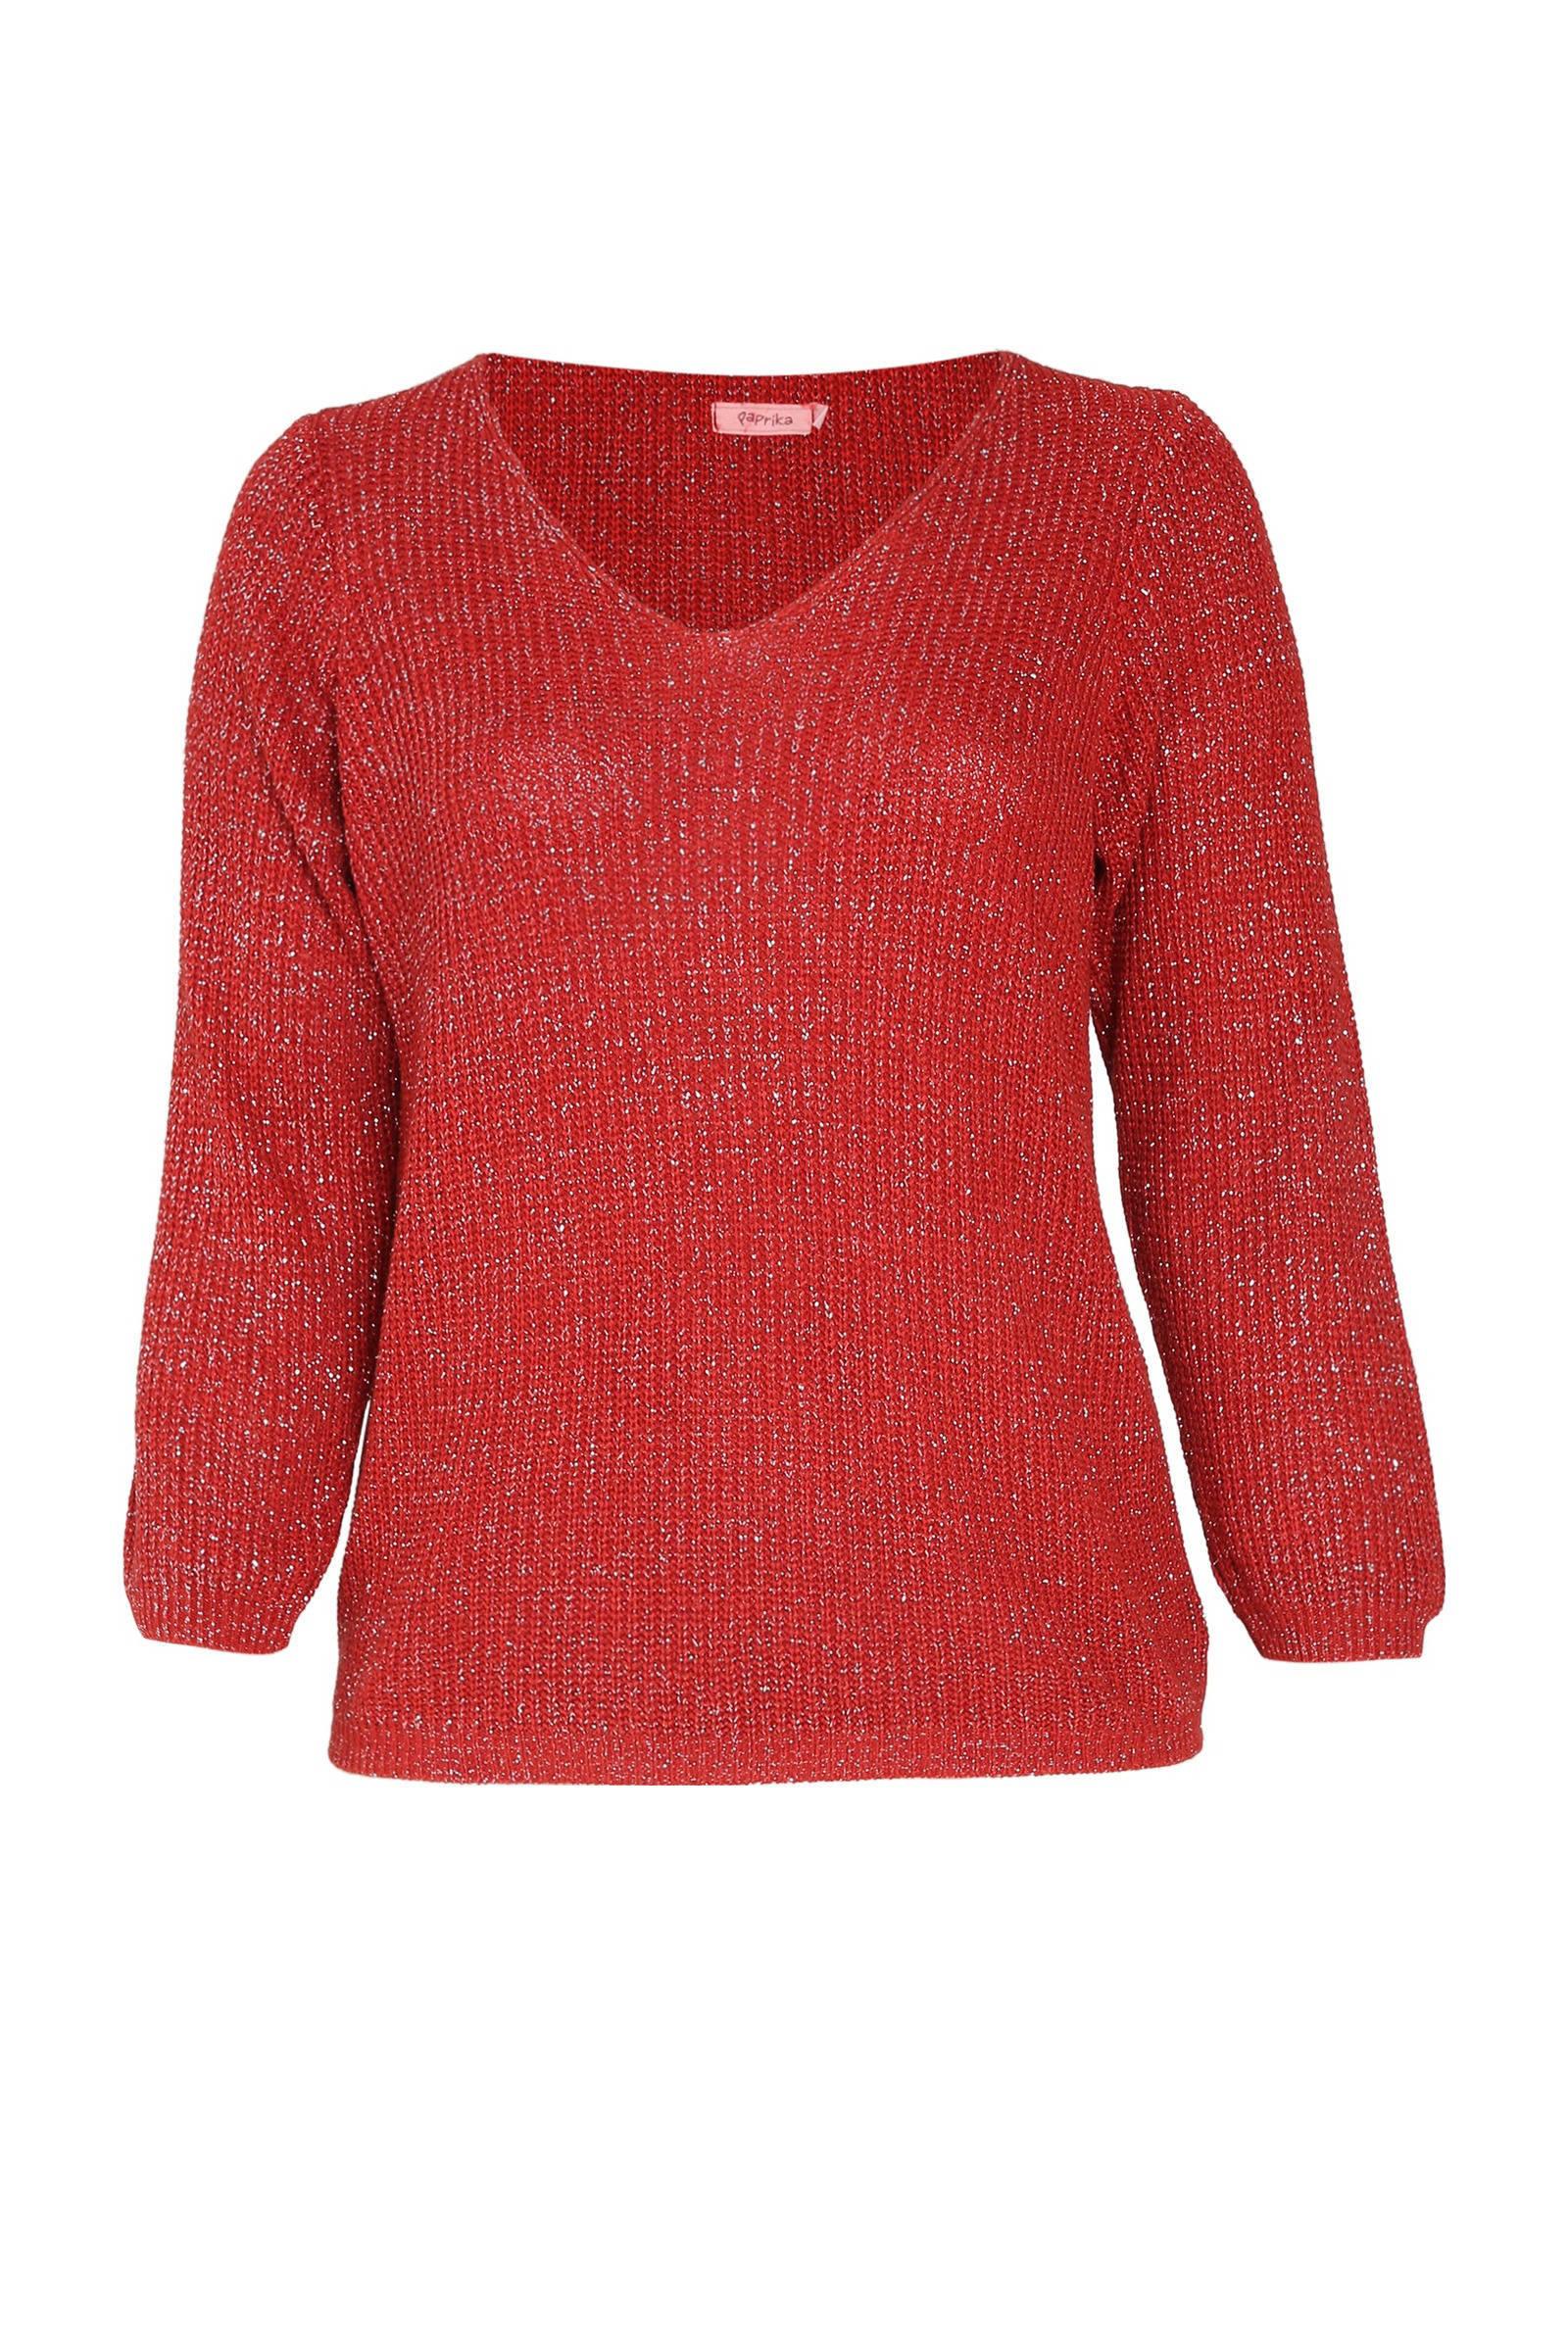 Paprika gebreide trui met glitters roodzilver | wehkamp